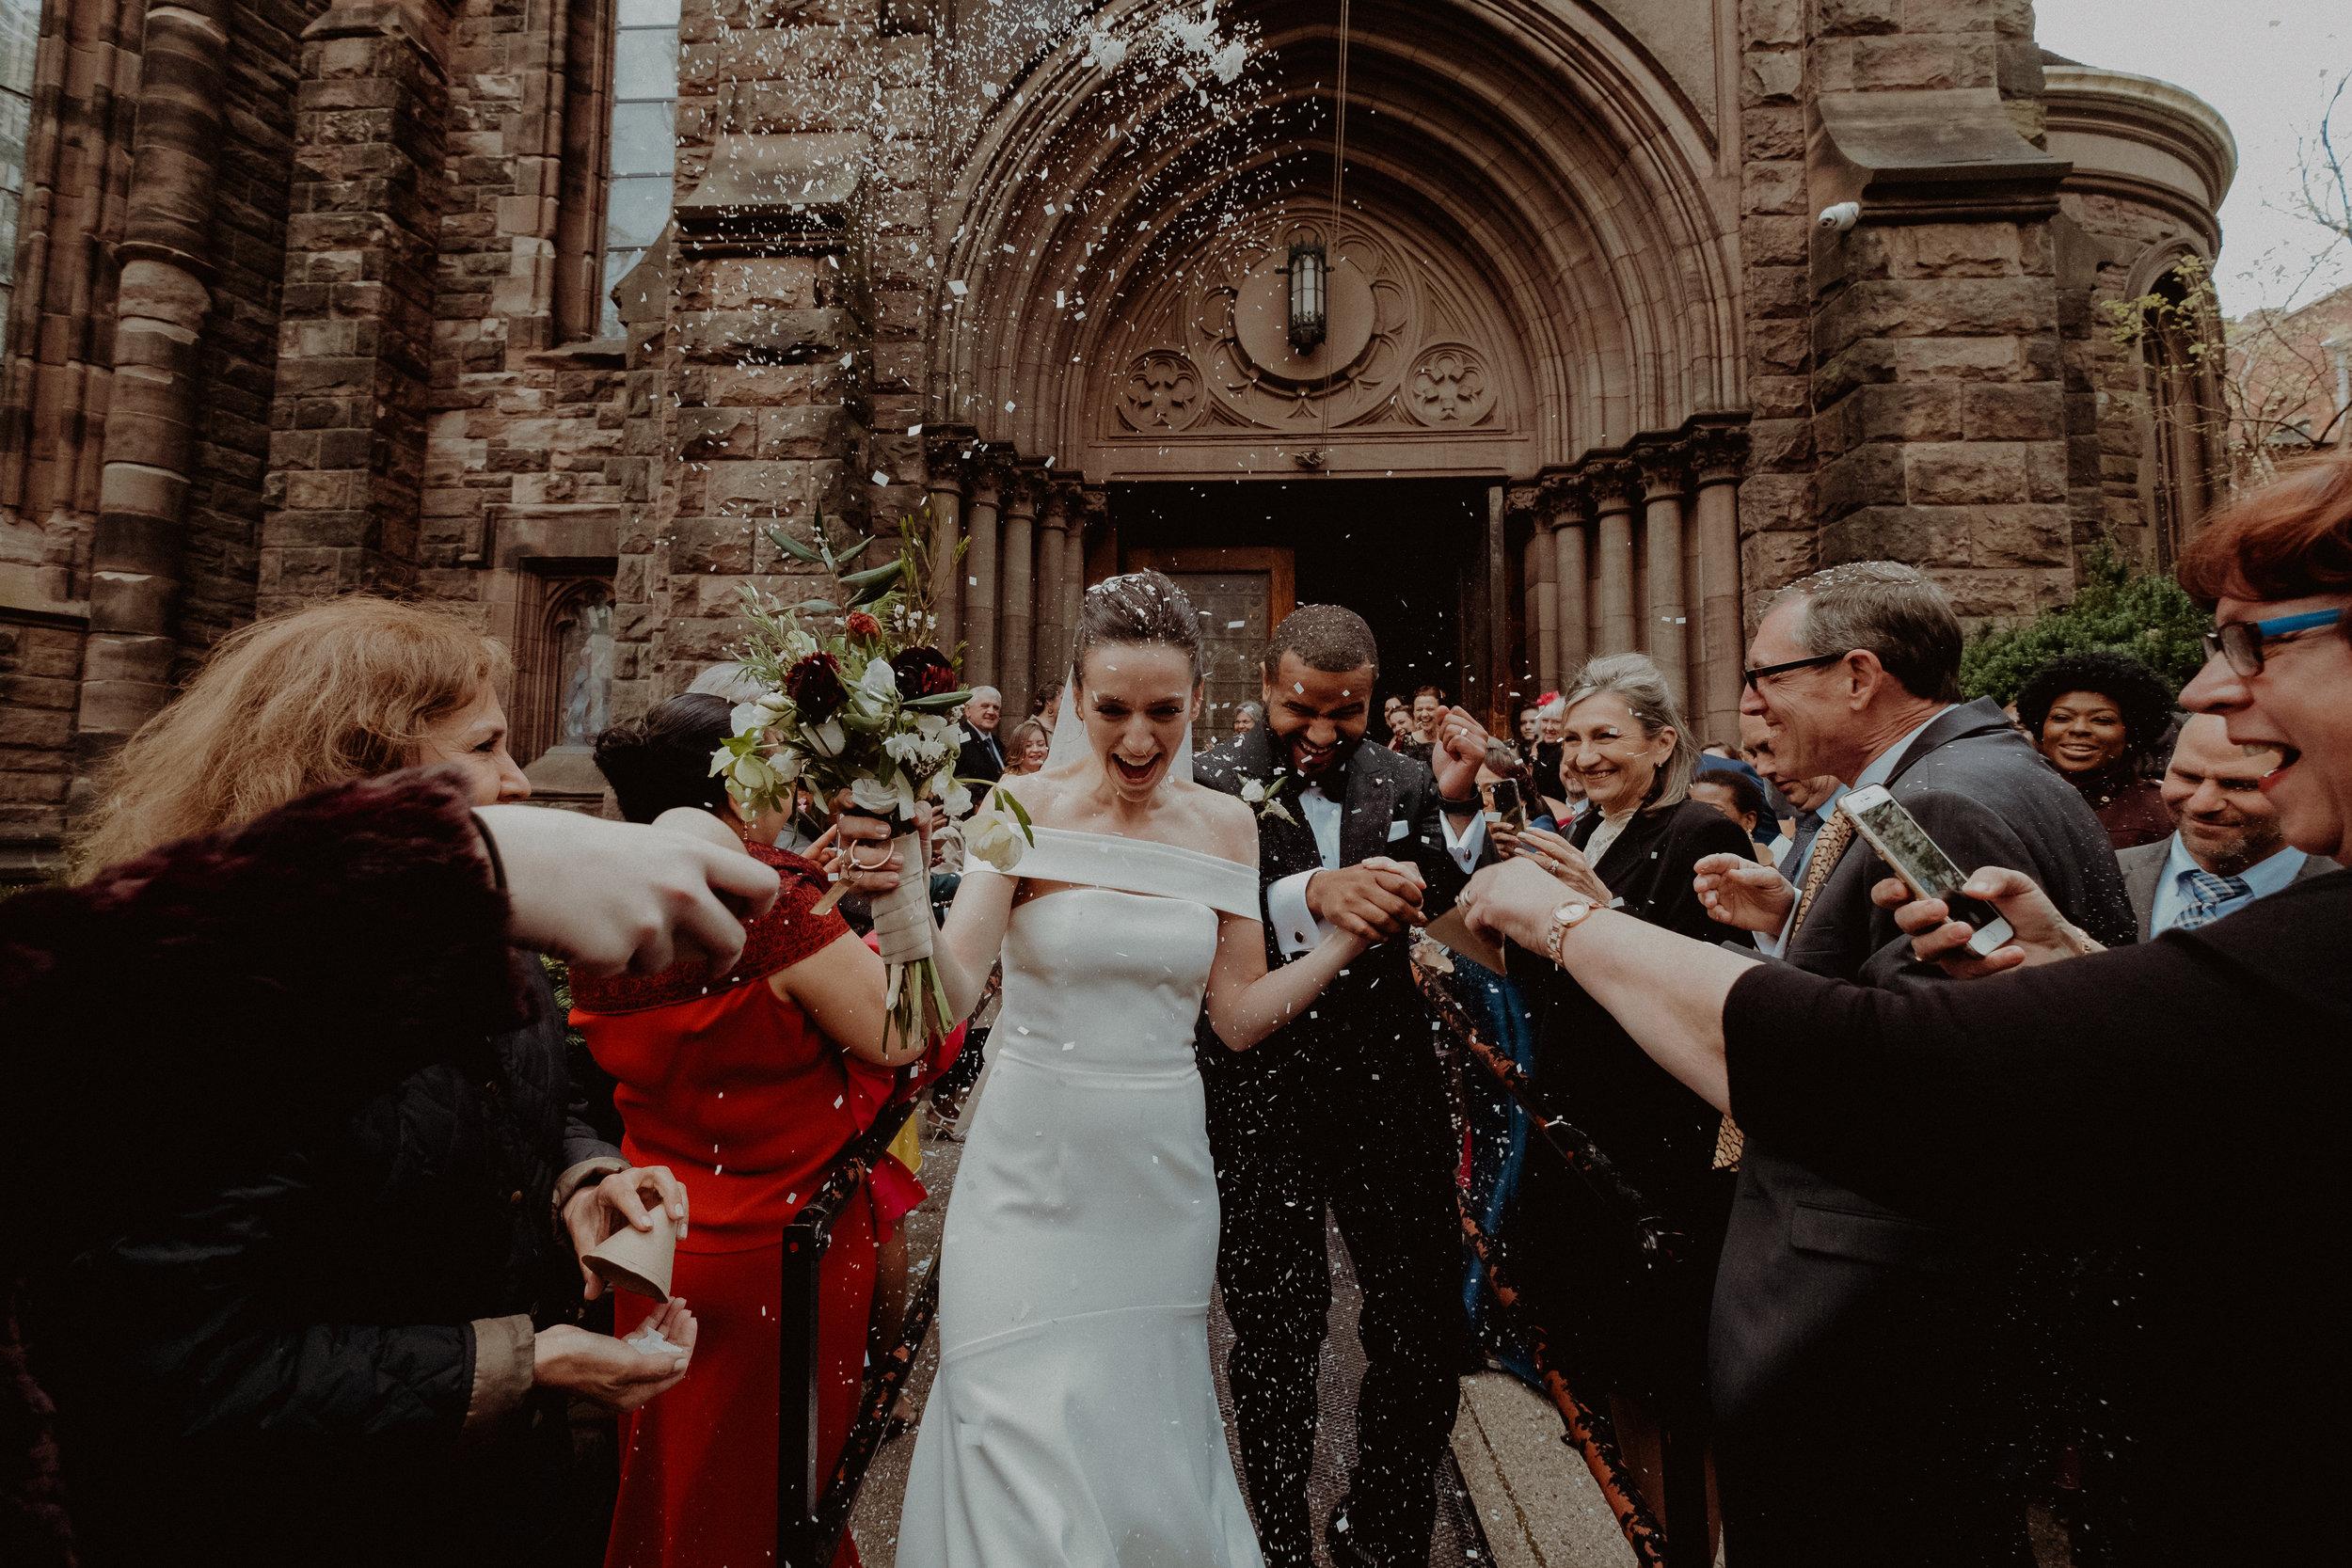 Metropolitan_Building_Wedding_DemaineandMike_Brooklyn_Wedding_Photographer_Chellise_Michael_Photography-196.jpg